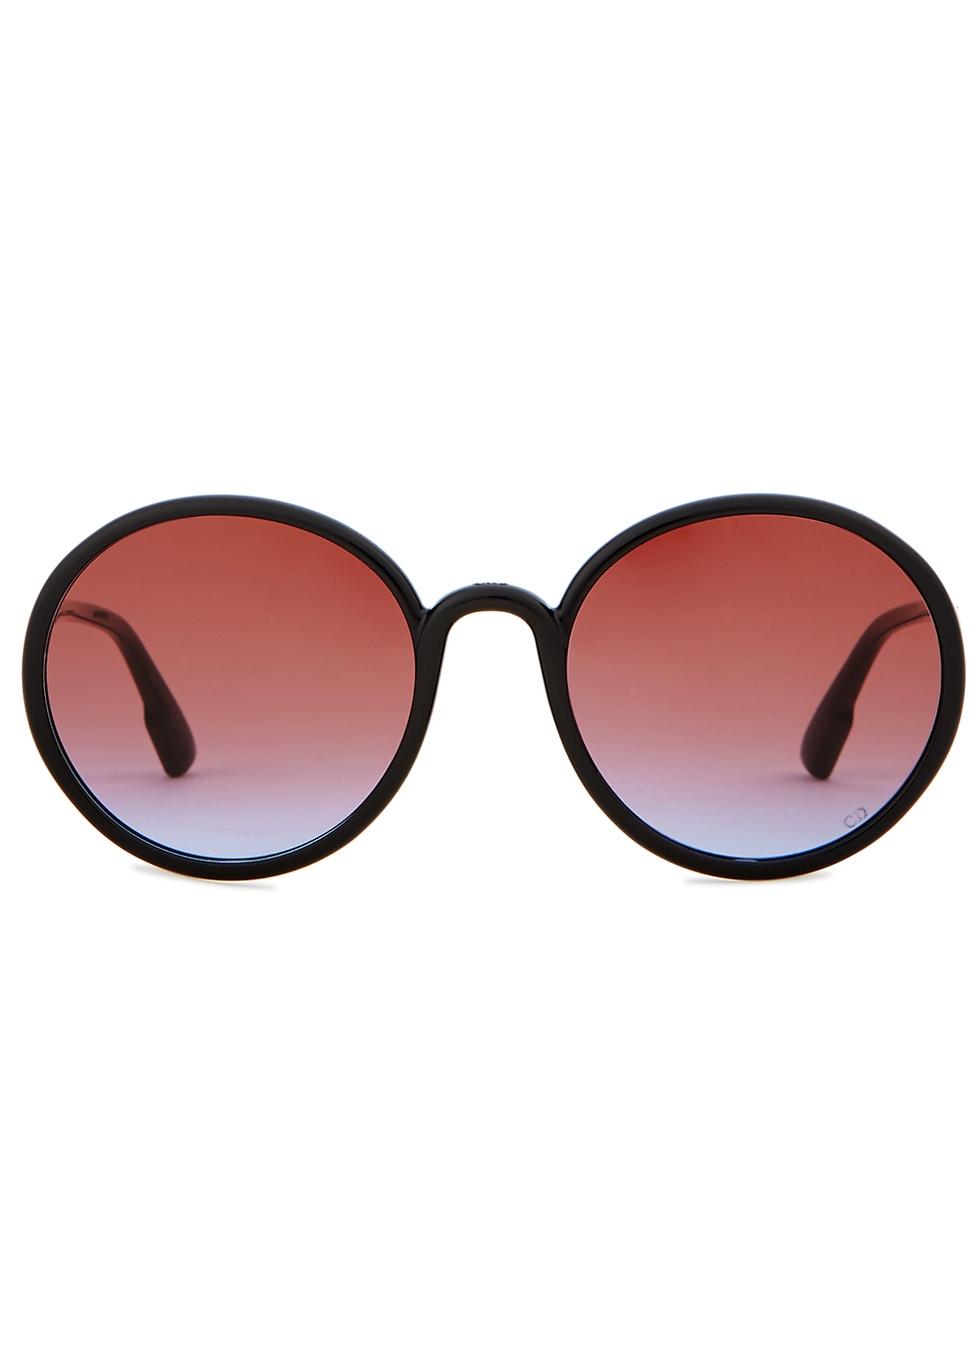 SoStellaire2 black round-frame sunglasses - Dior